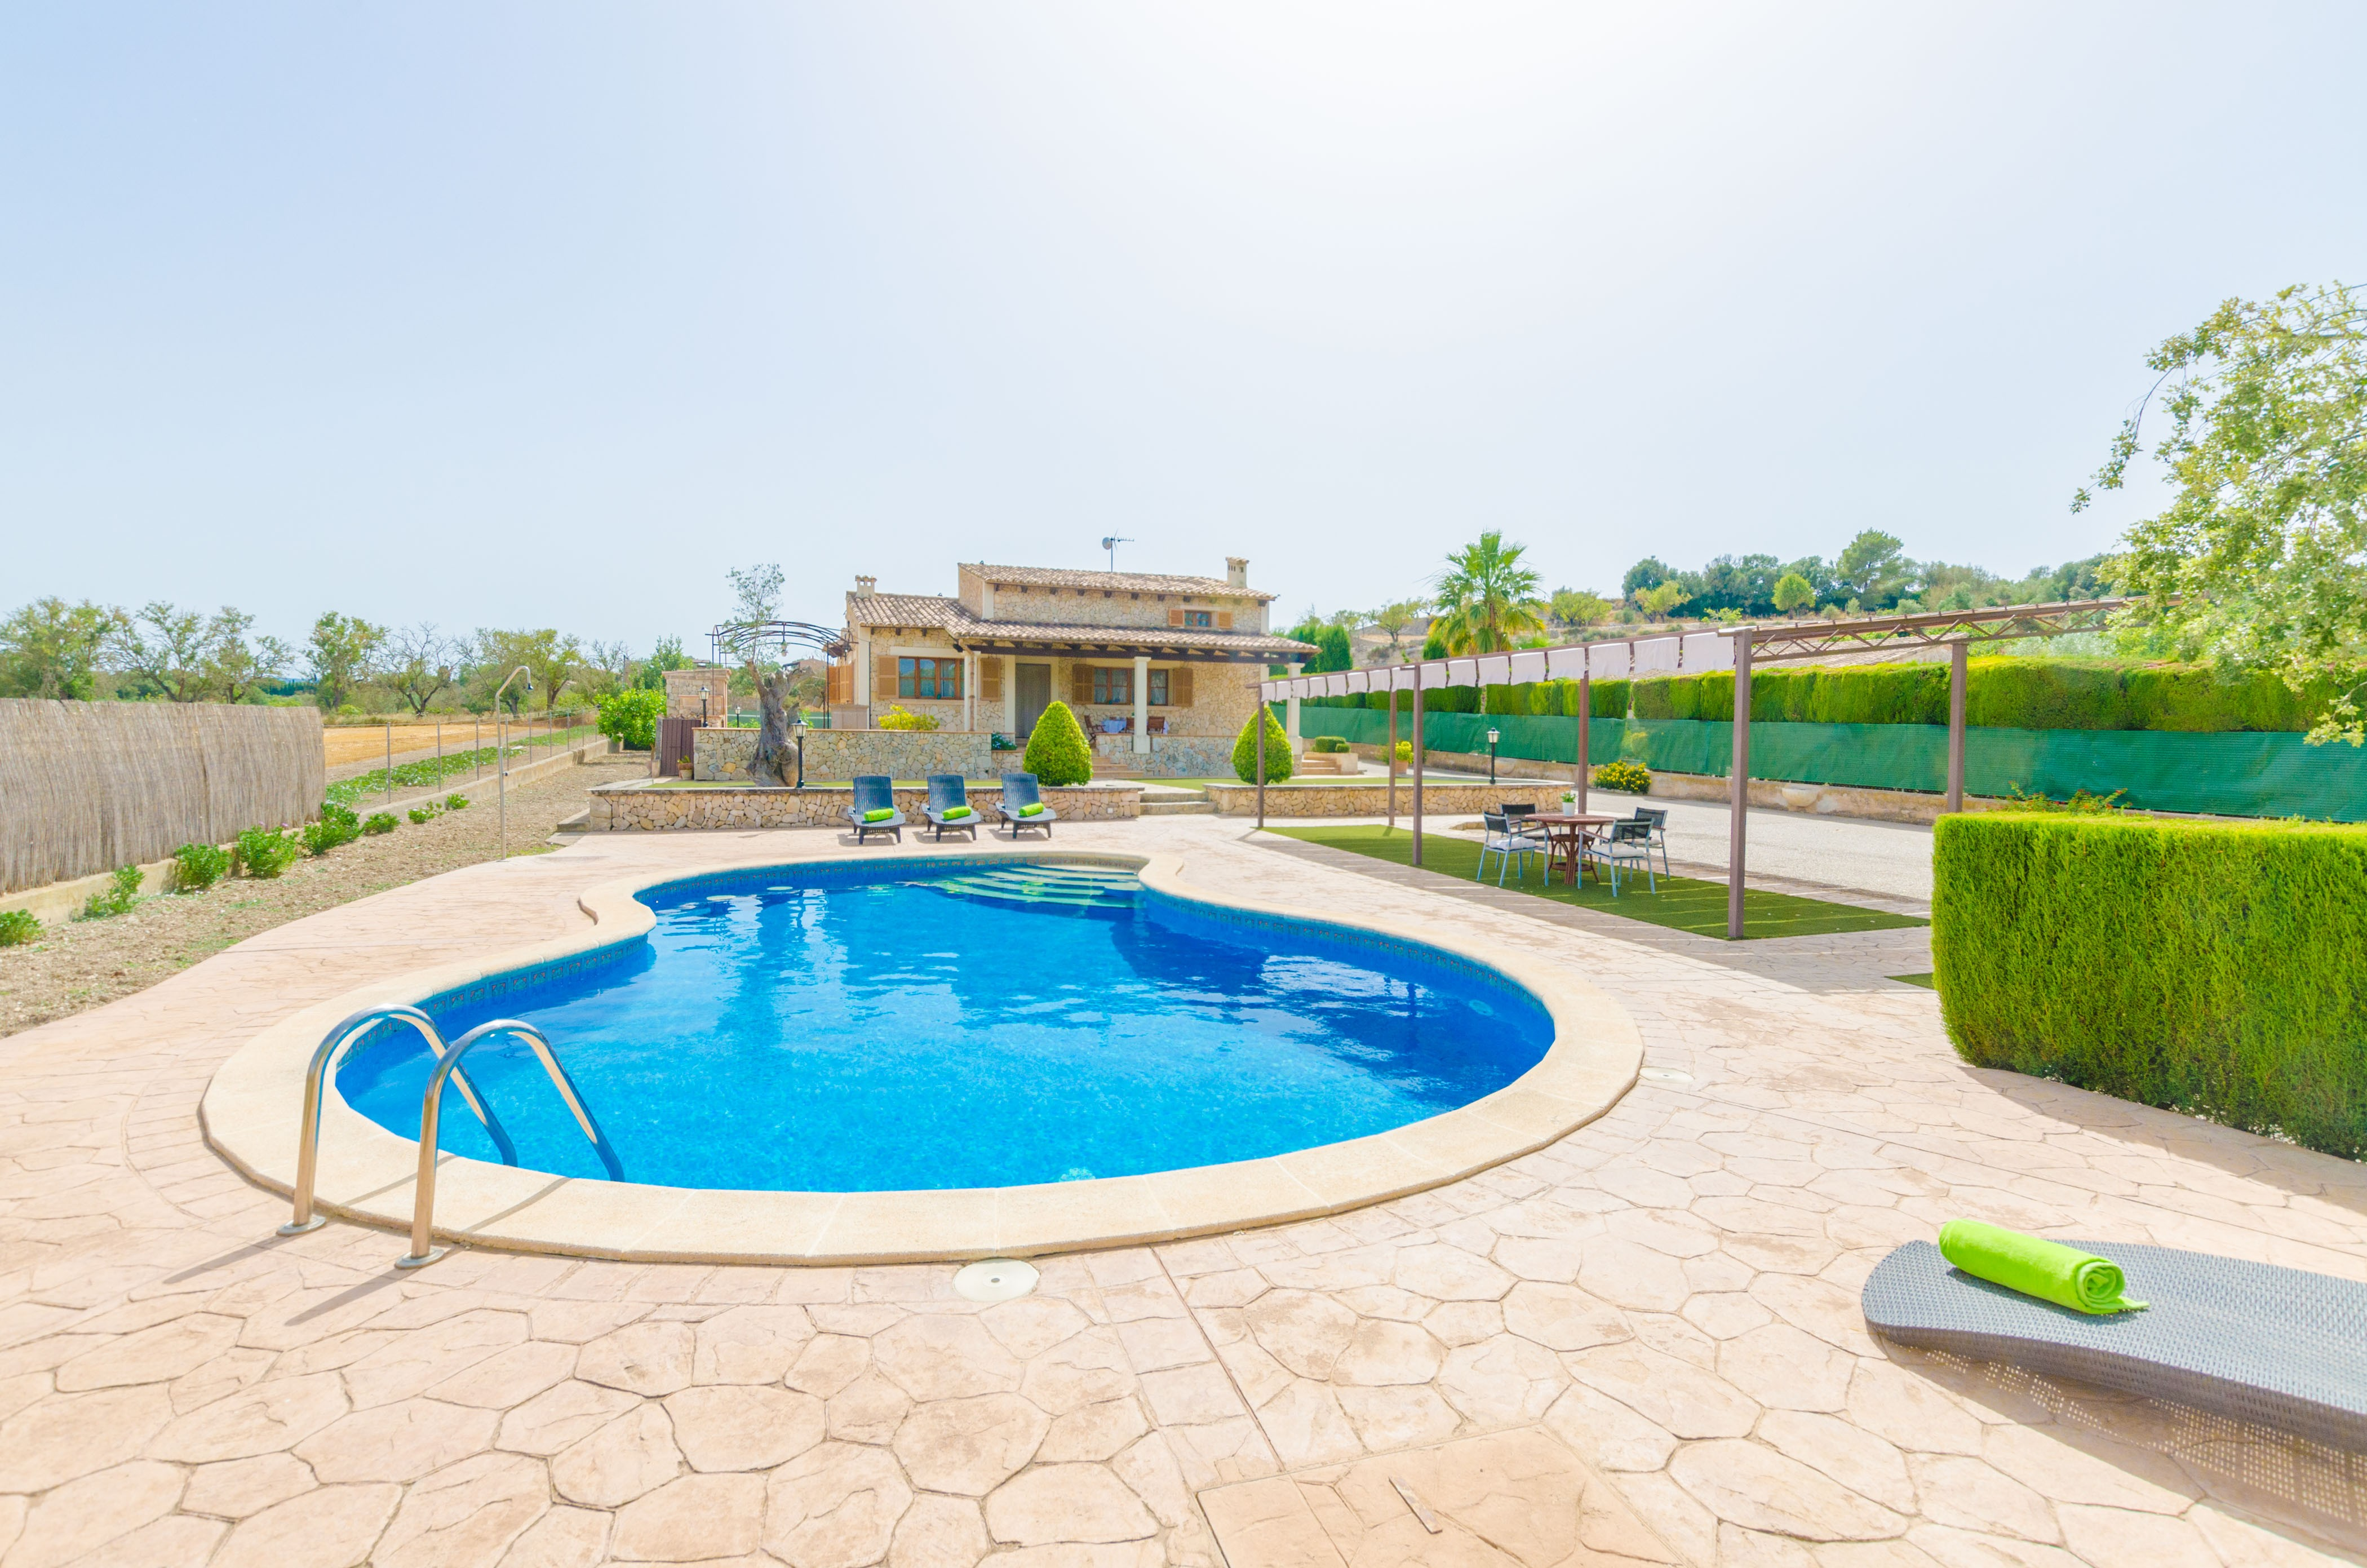 Maison de vacances SA SINIA (2374876), Lloret de Vistalegre, Majorque, Iles Baléares, Espagne, image 37